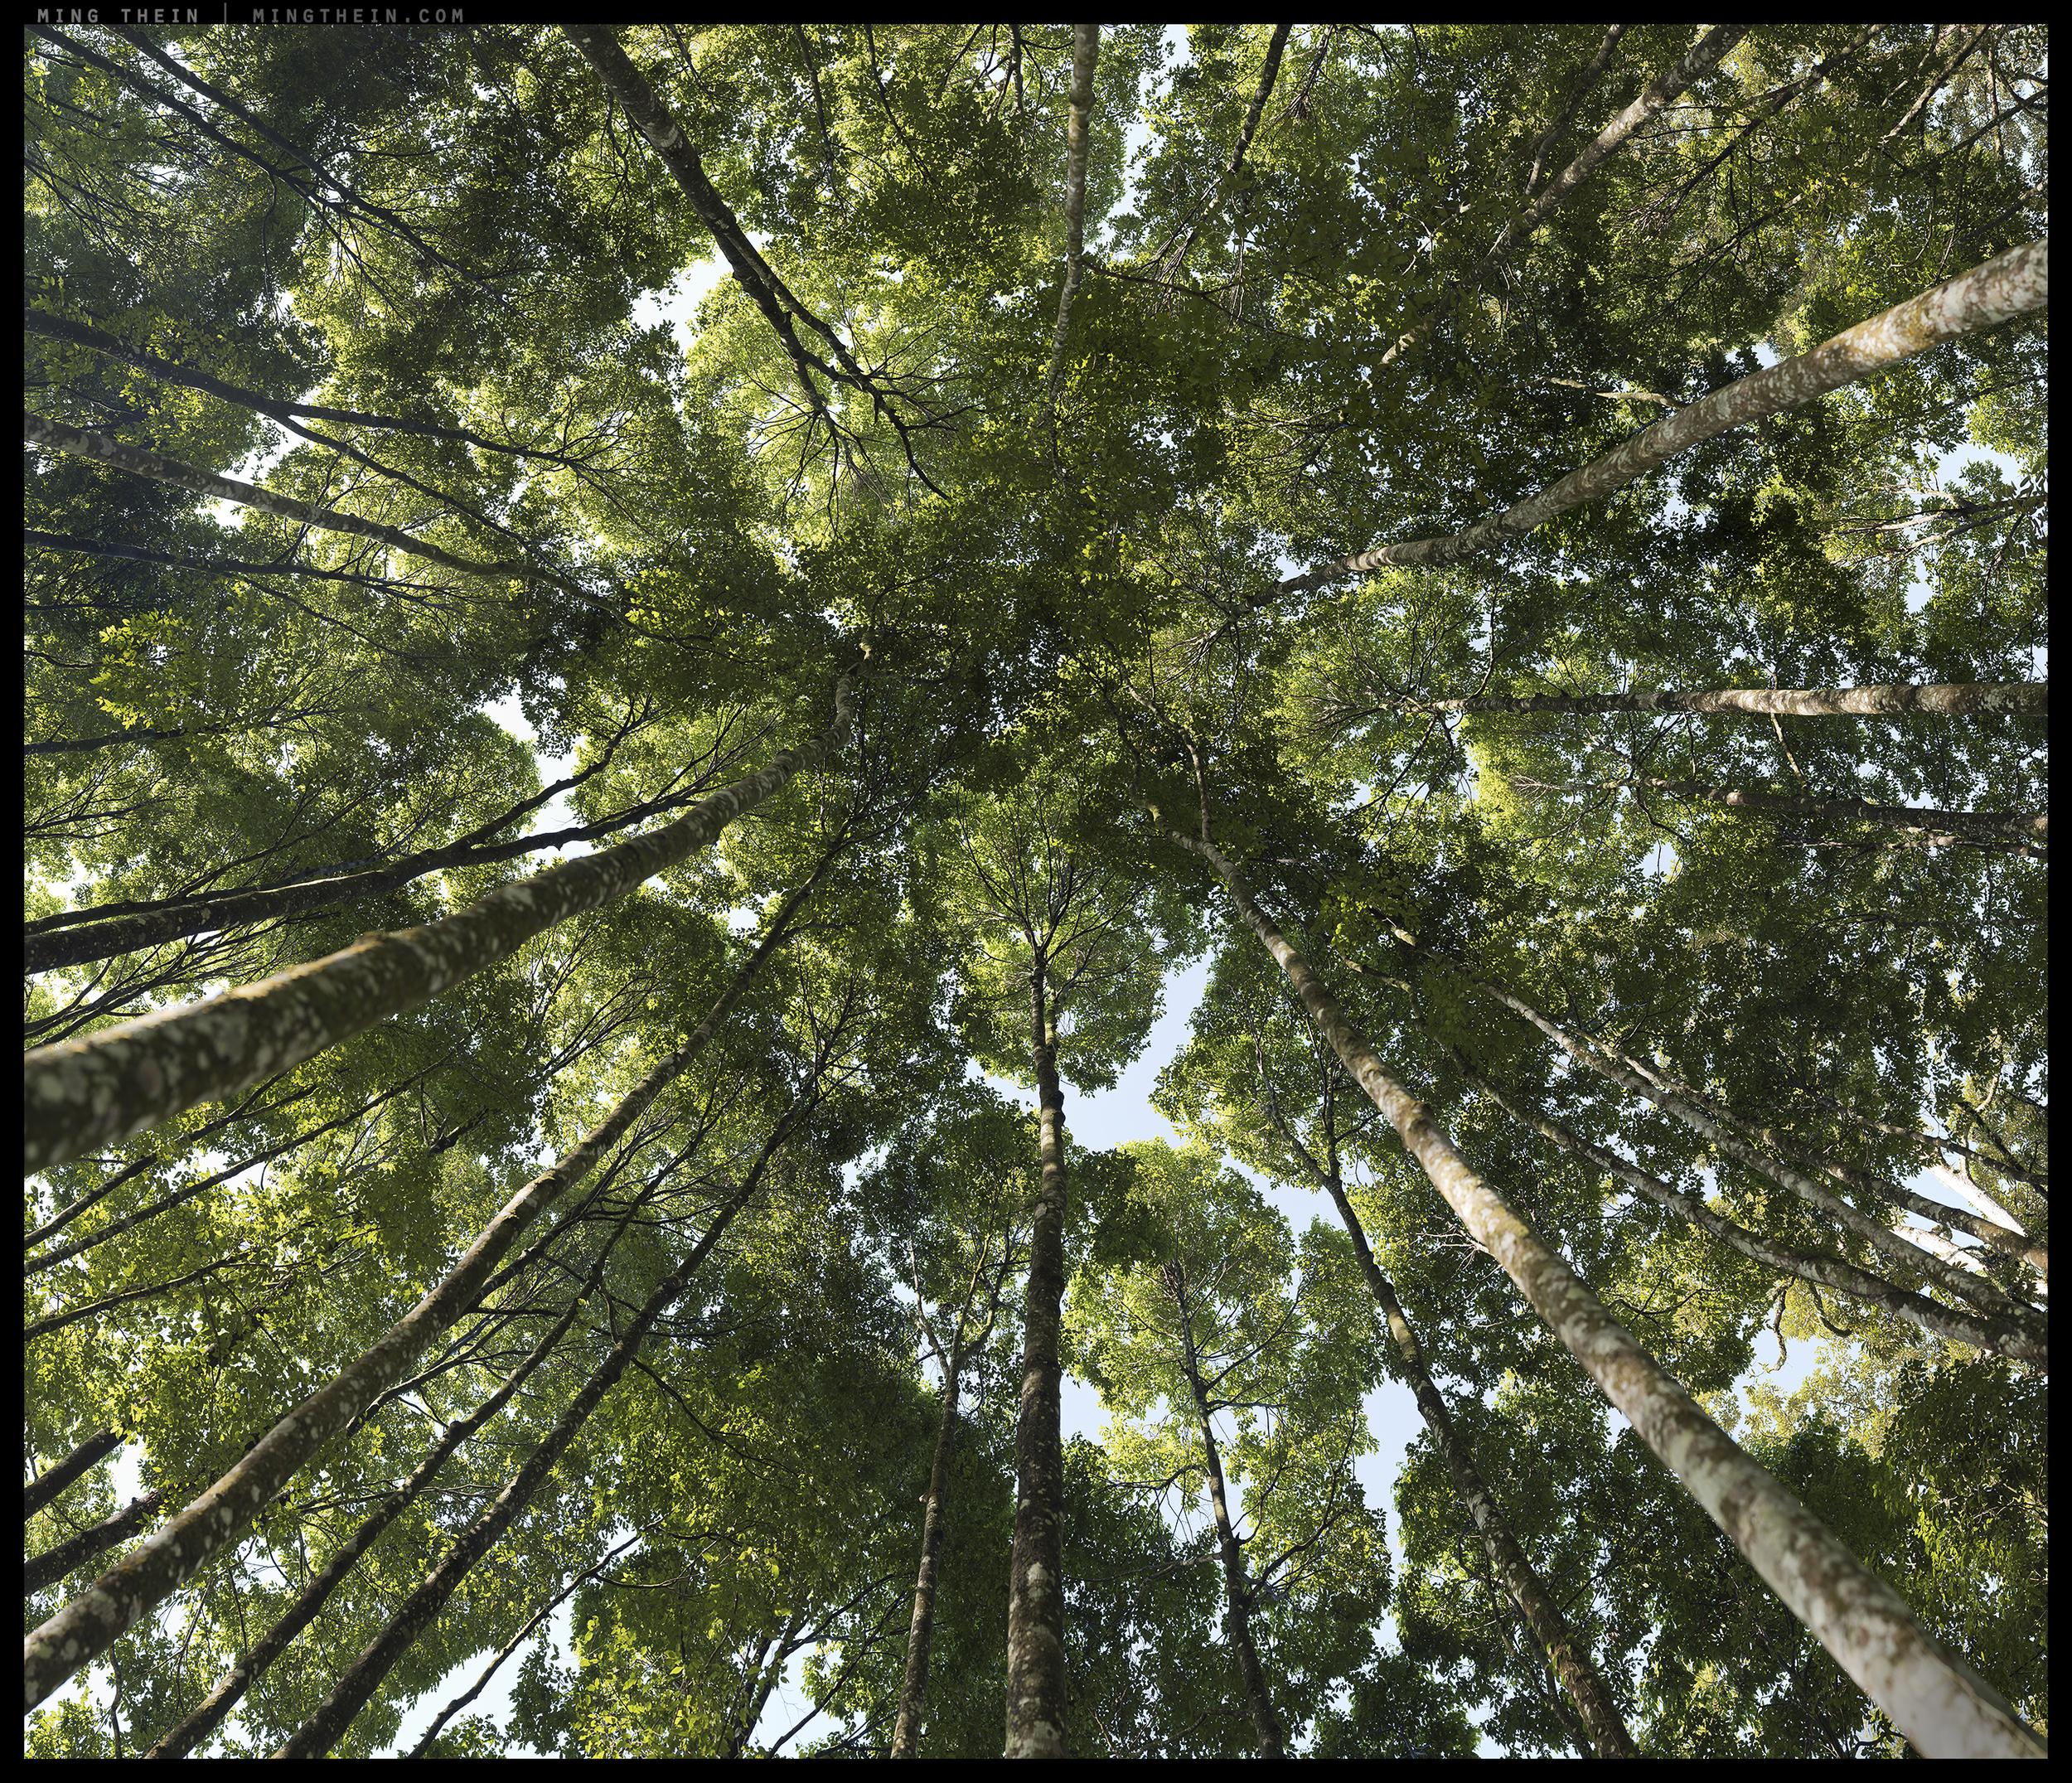 _8B010973-1007 16-37 forest vii v3 14k.jpg